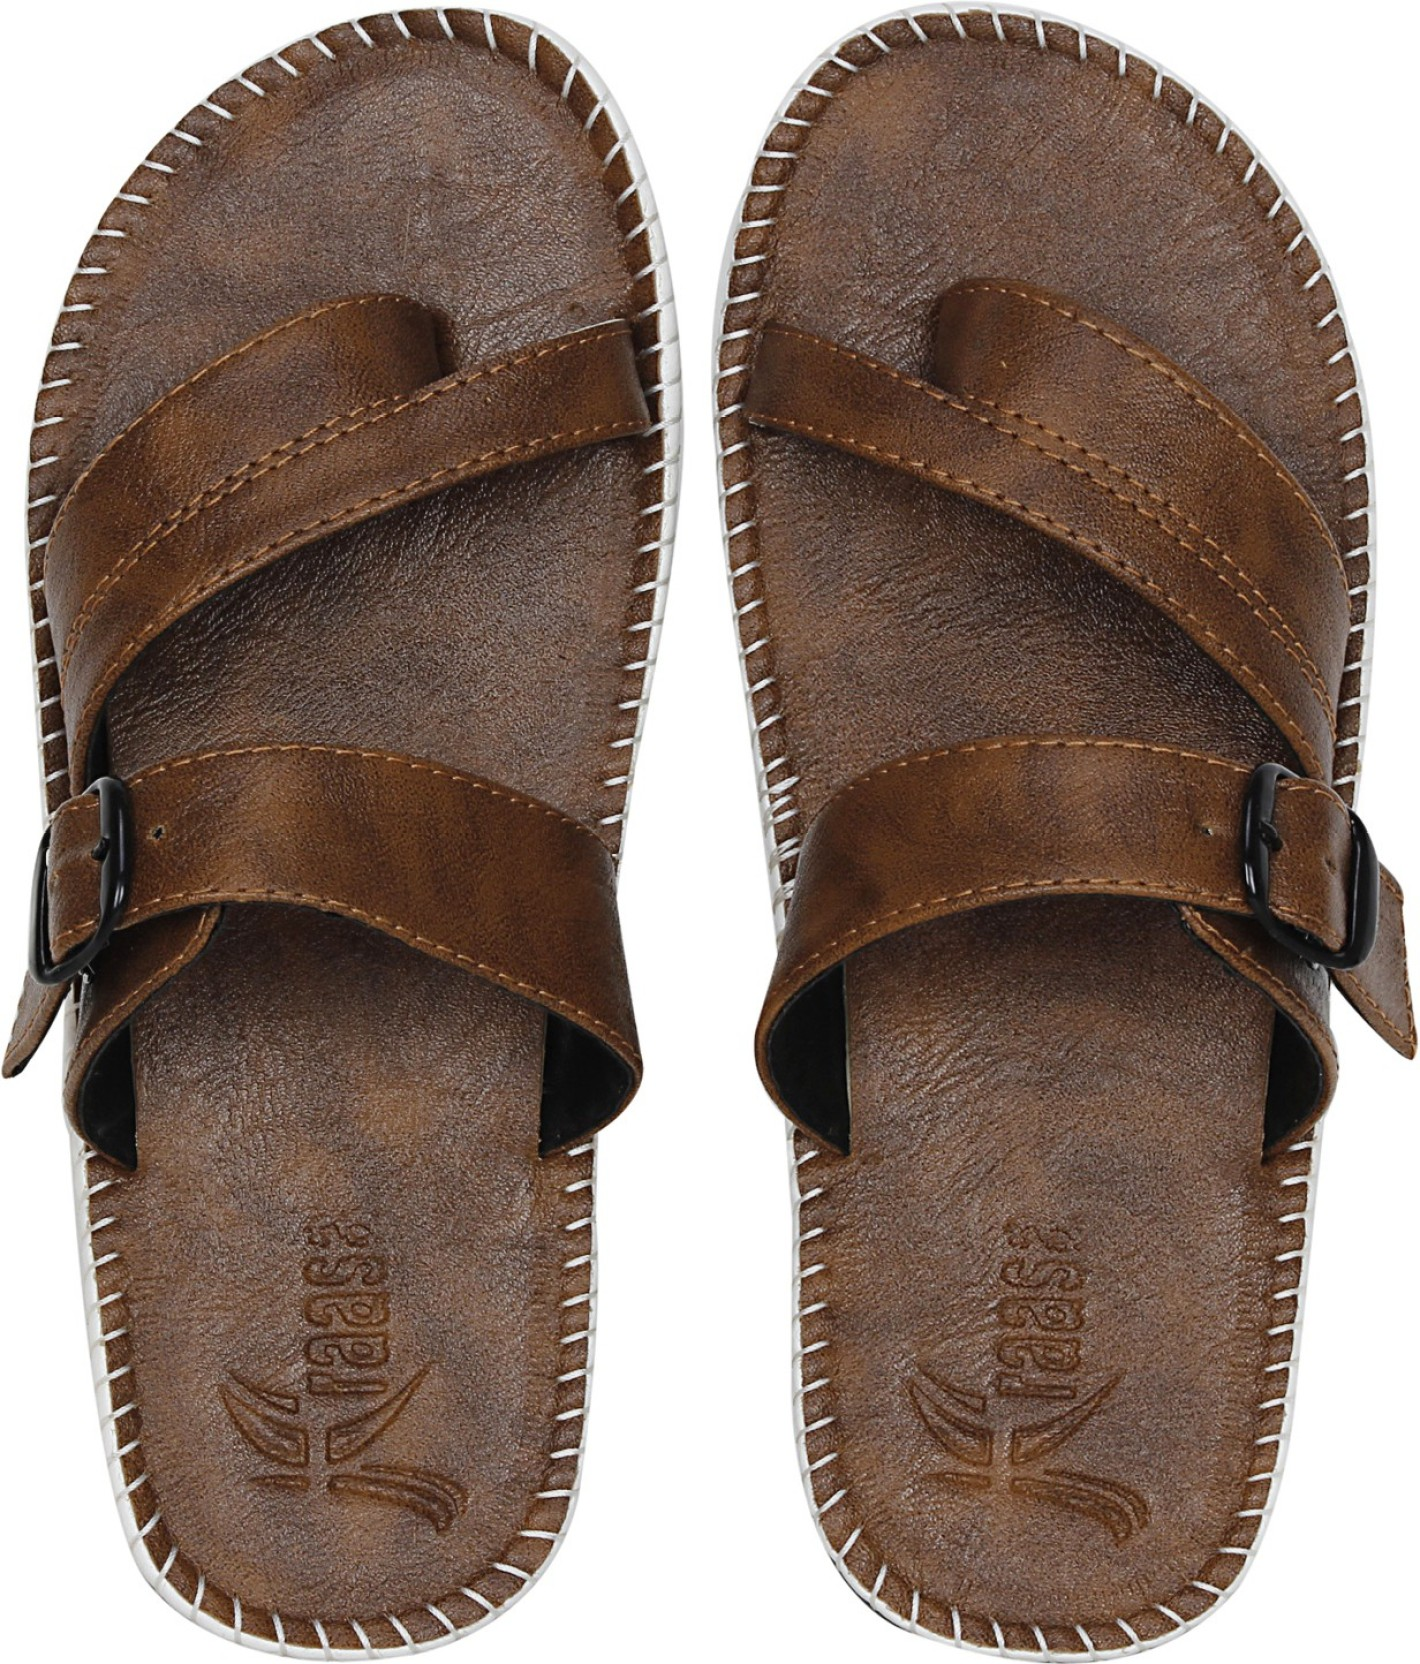 8c4b50a54 Kraasa Slippers - Buy Camel Color Kraasa Slippers Online at Best ...